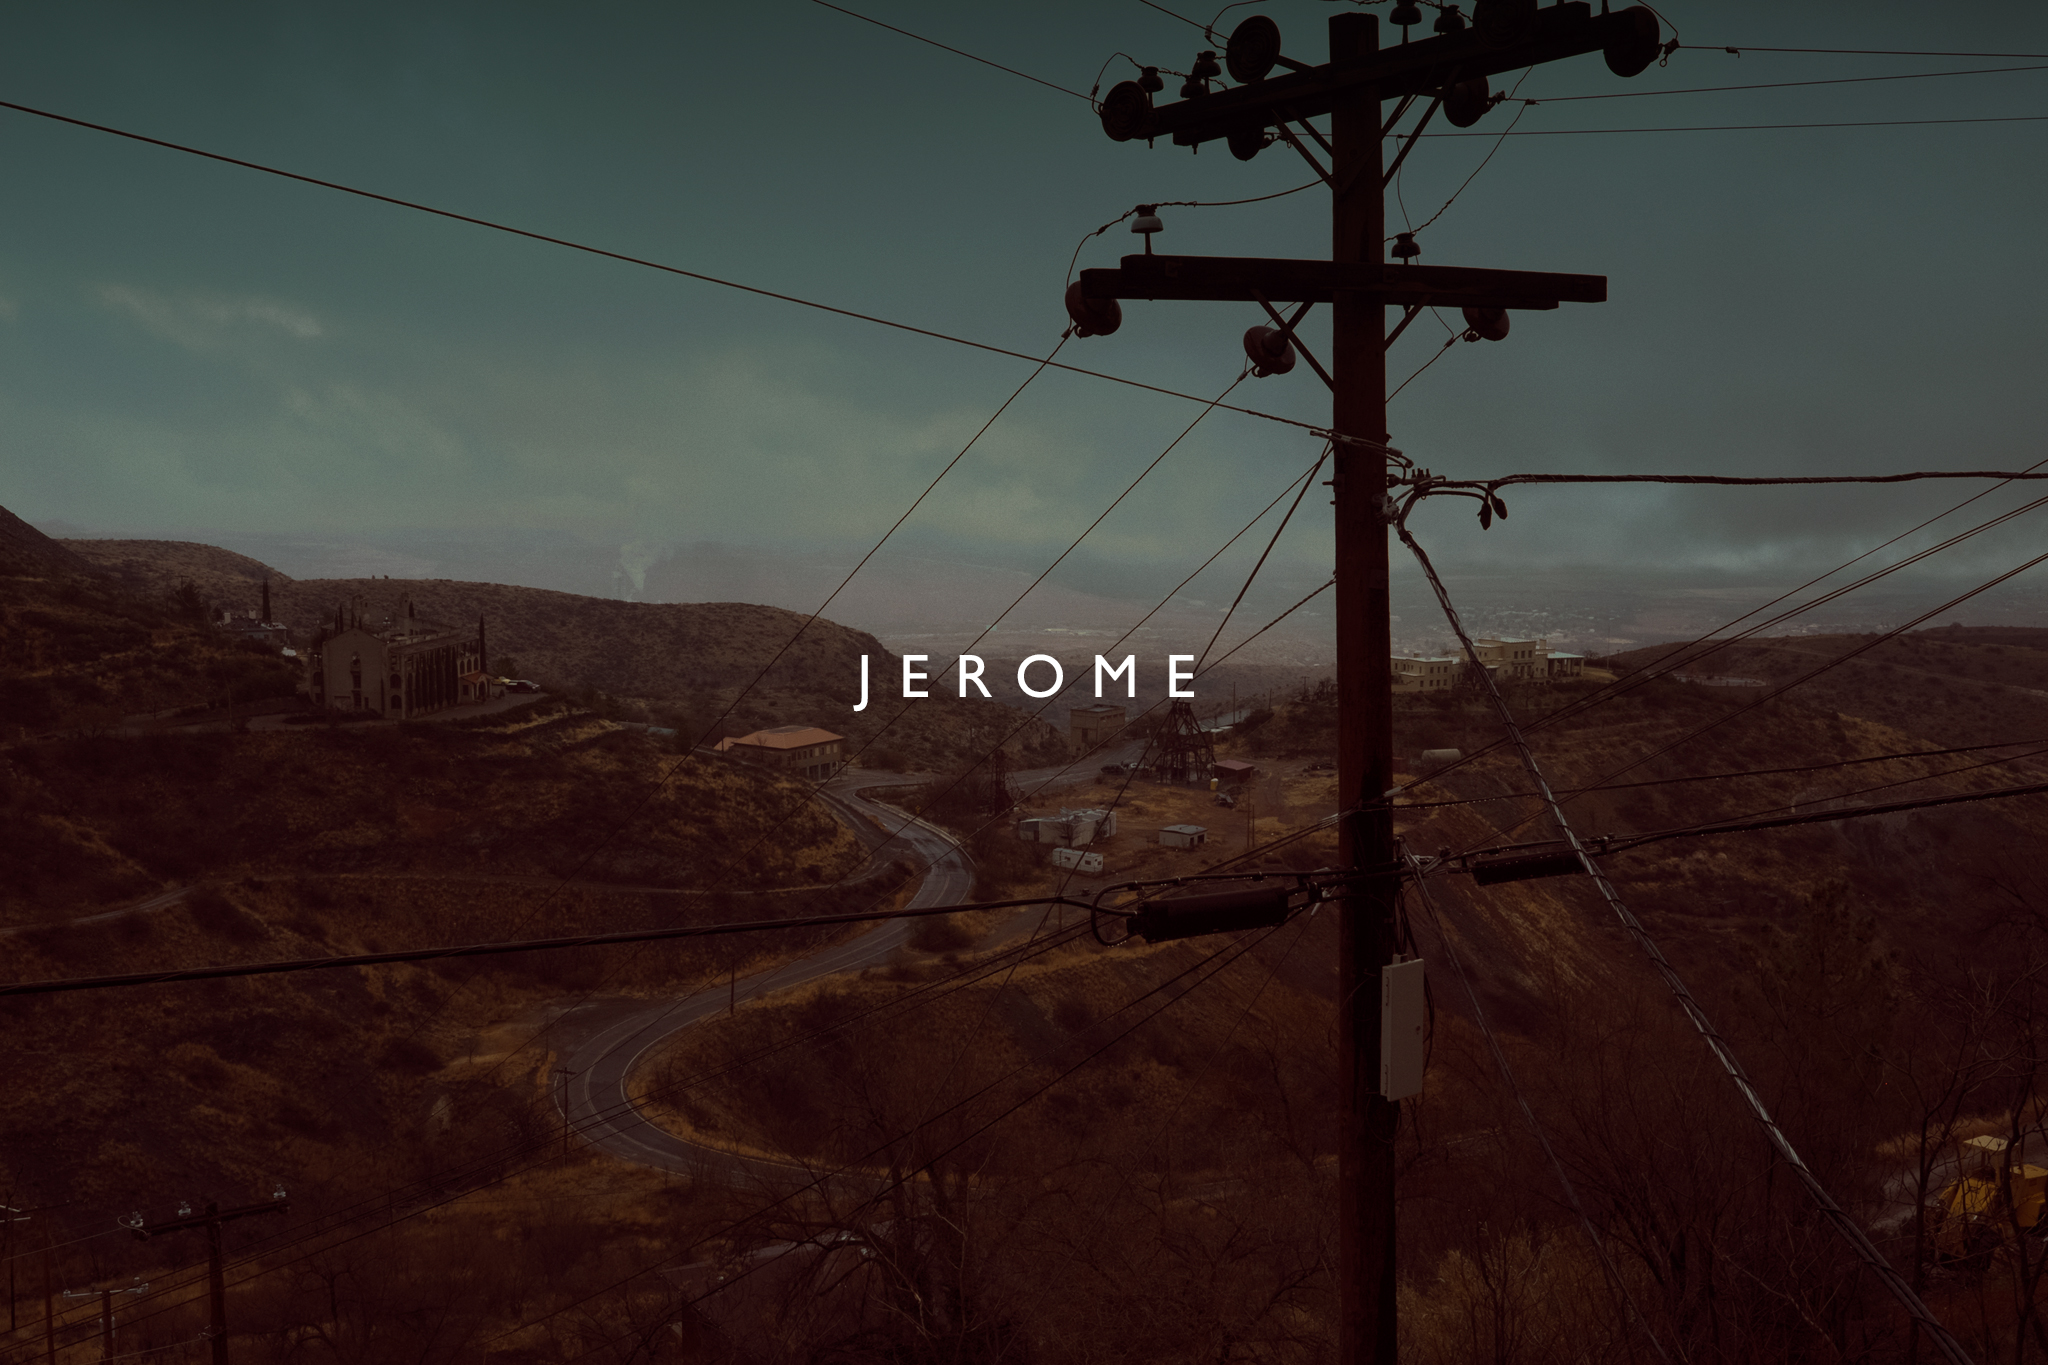 Jerome-Arizona-Derek-Heisler